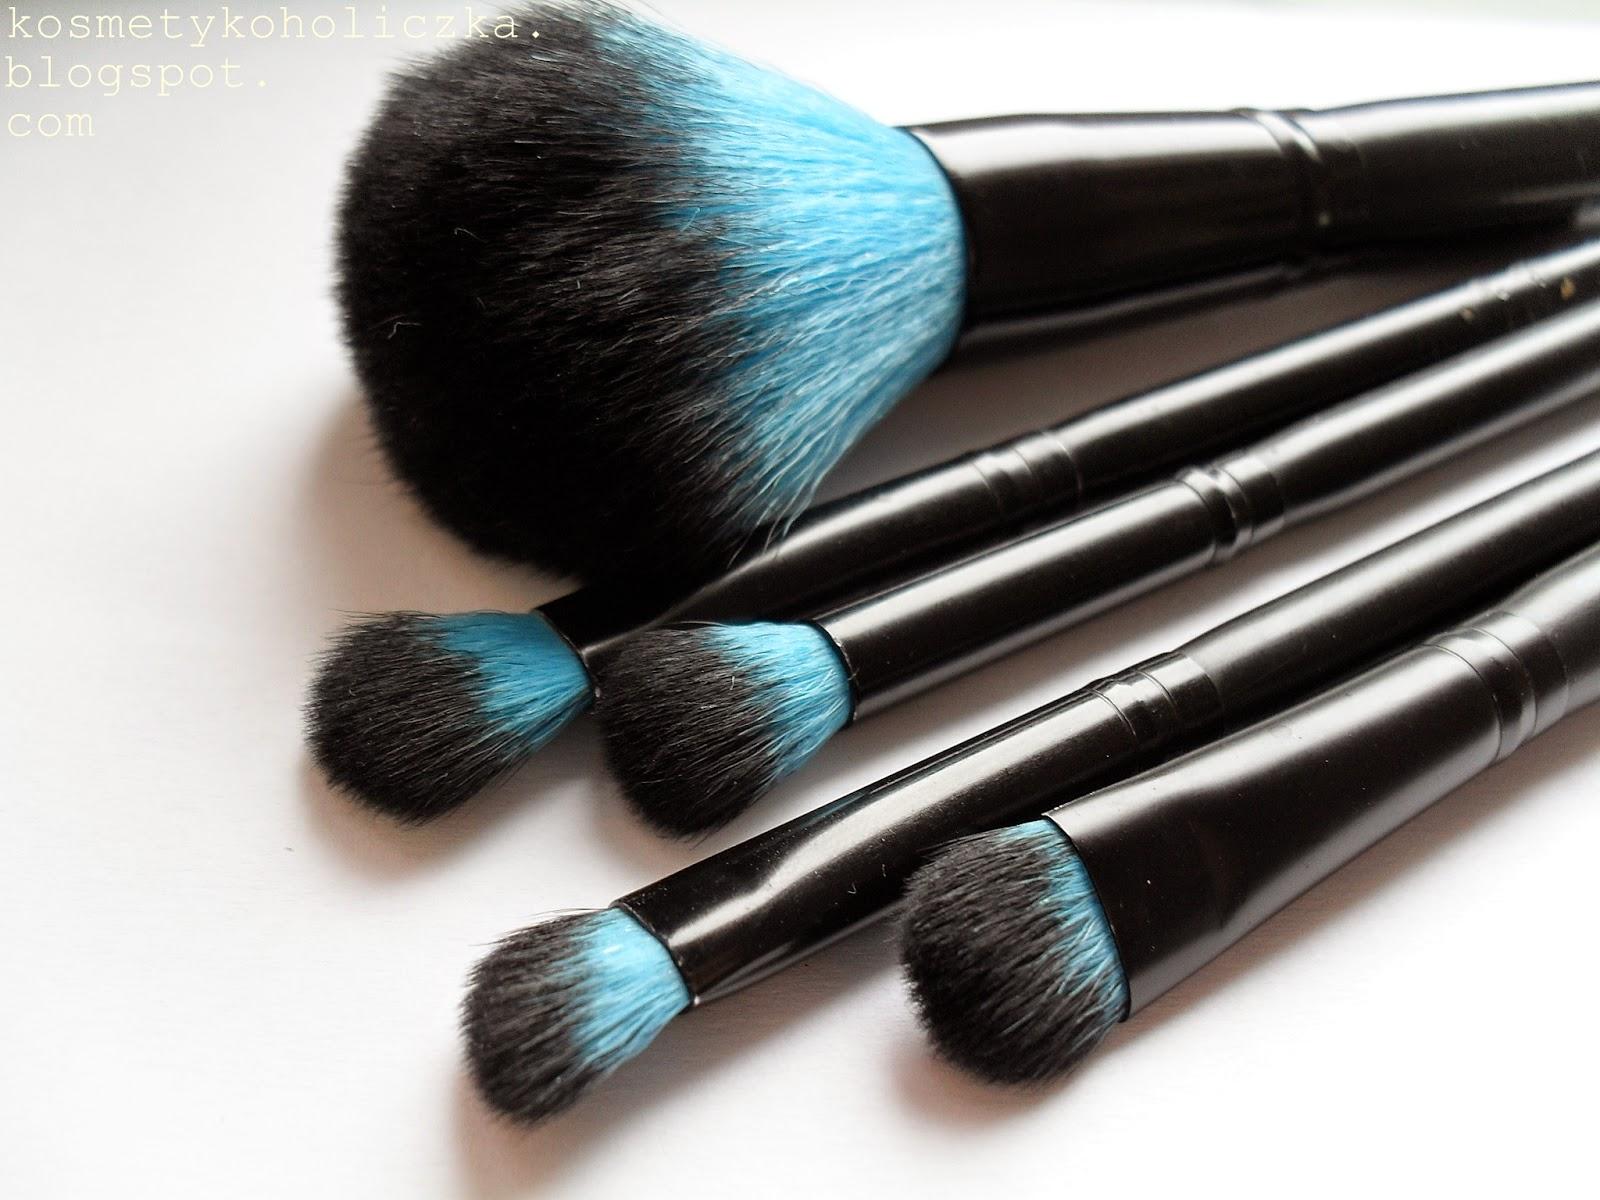 Pędzle do makijażu: Sunshade Minerals: recenzja